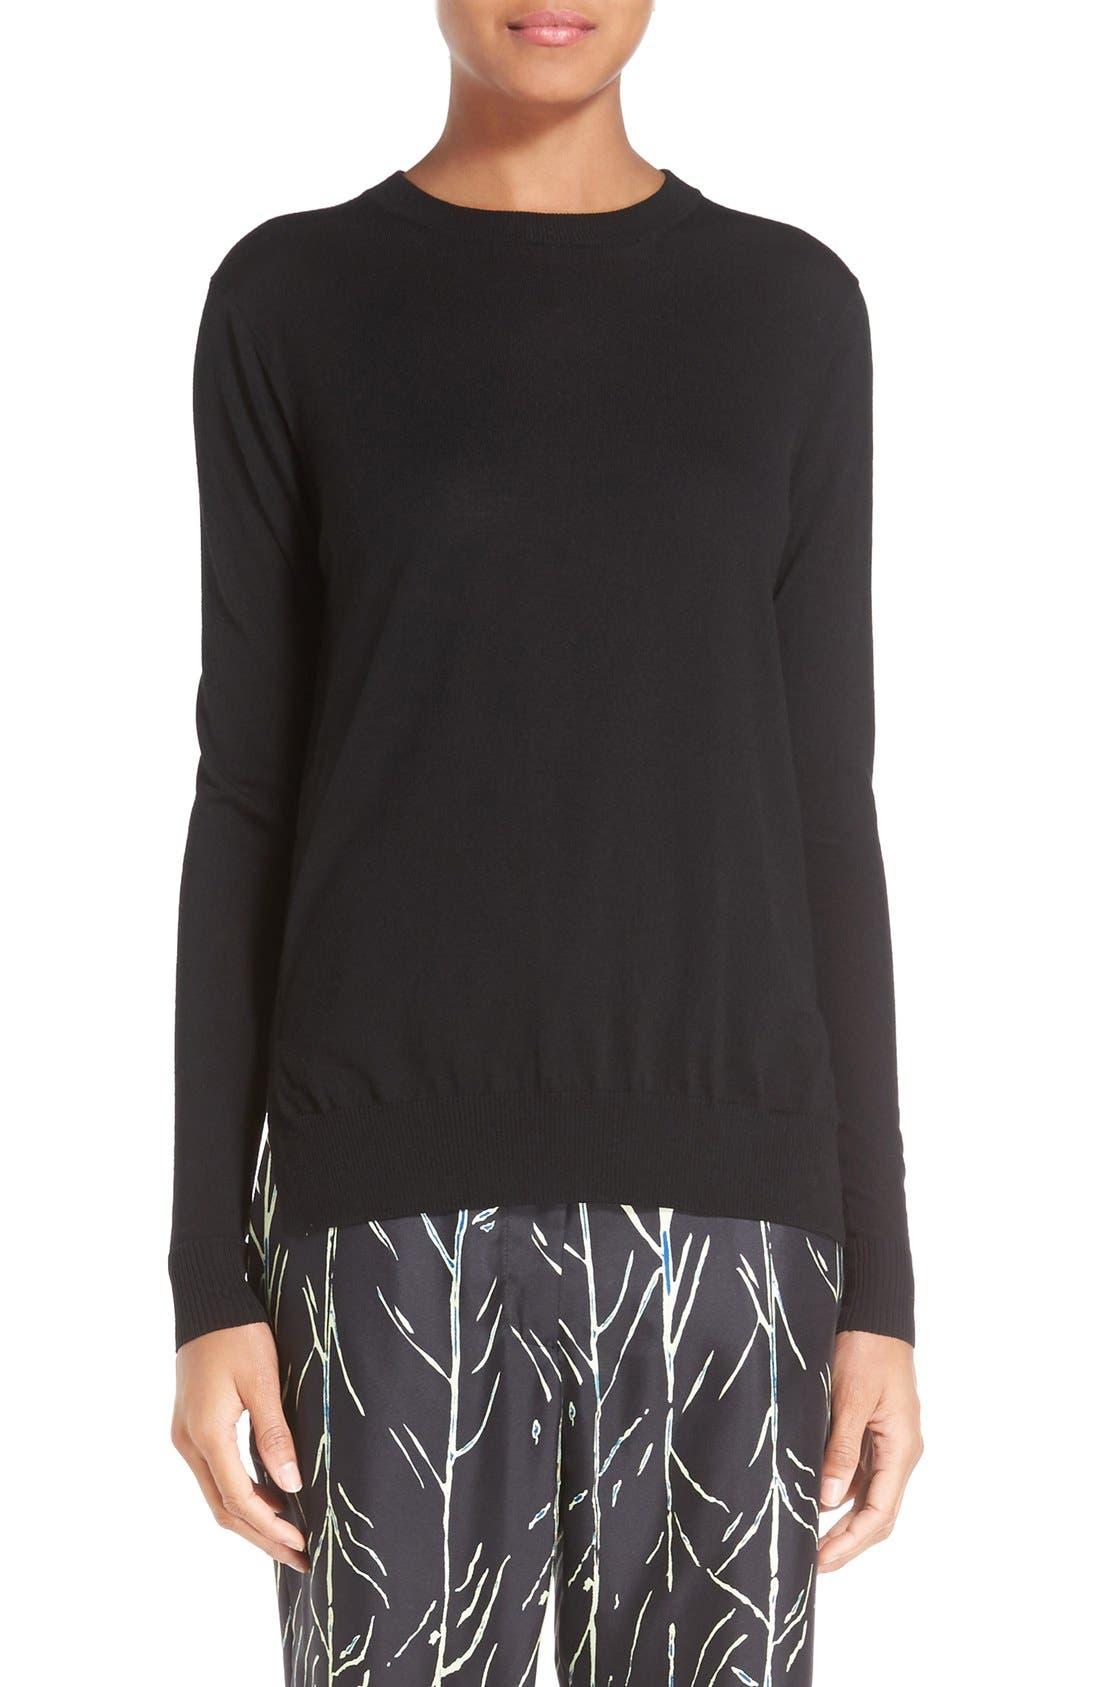 Superfine Merino Wool Sweater,                             Main thumbnail 1, color,                             Black